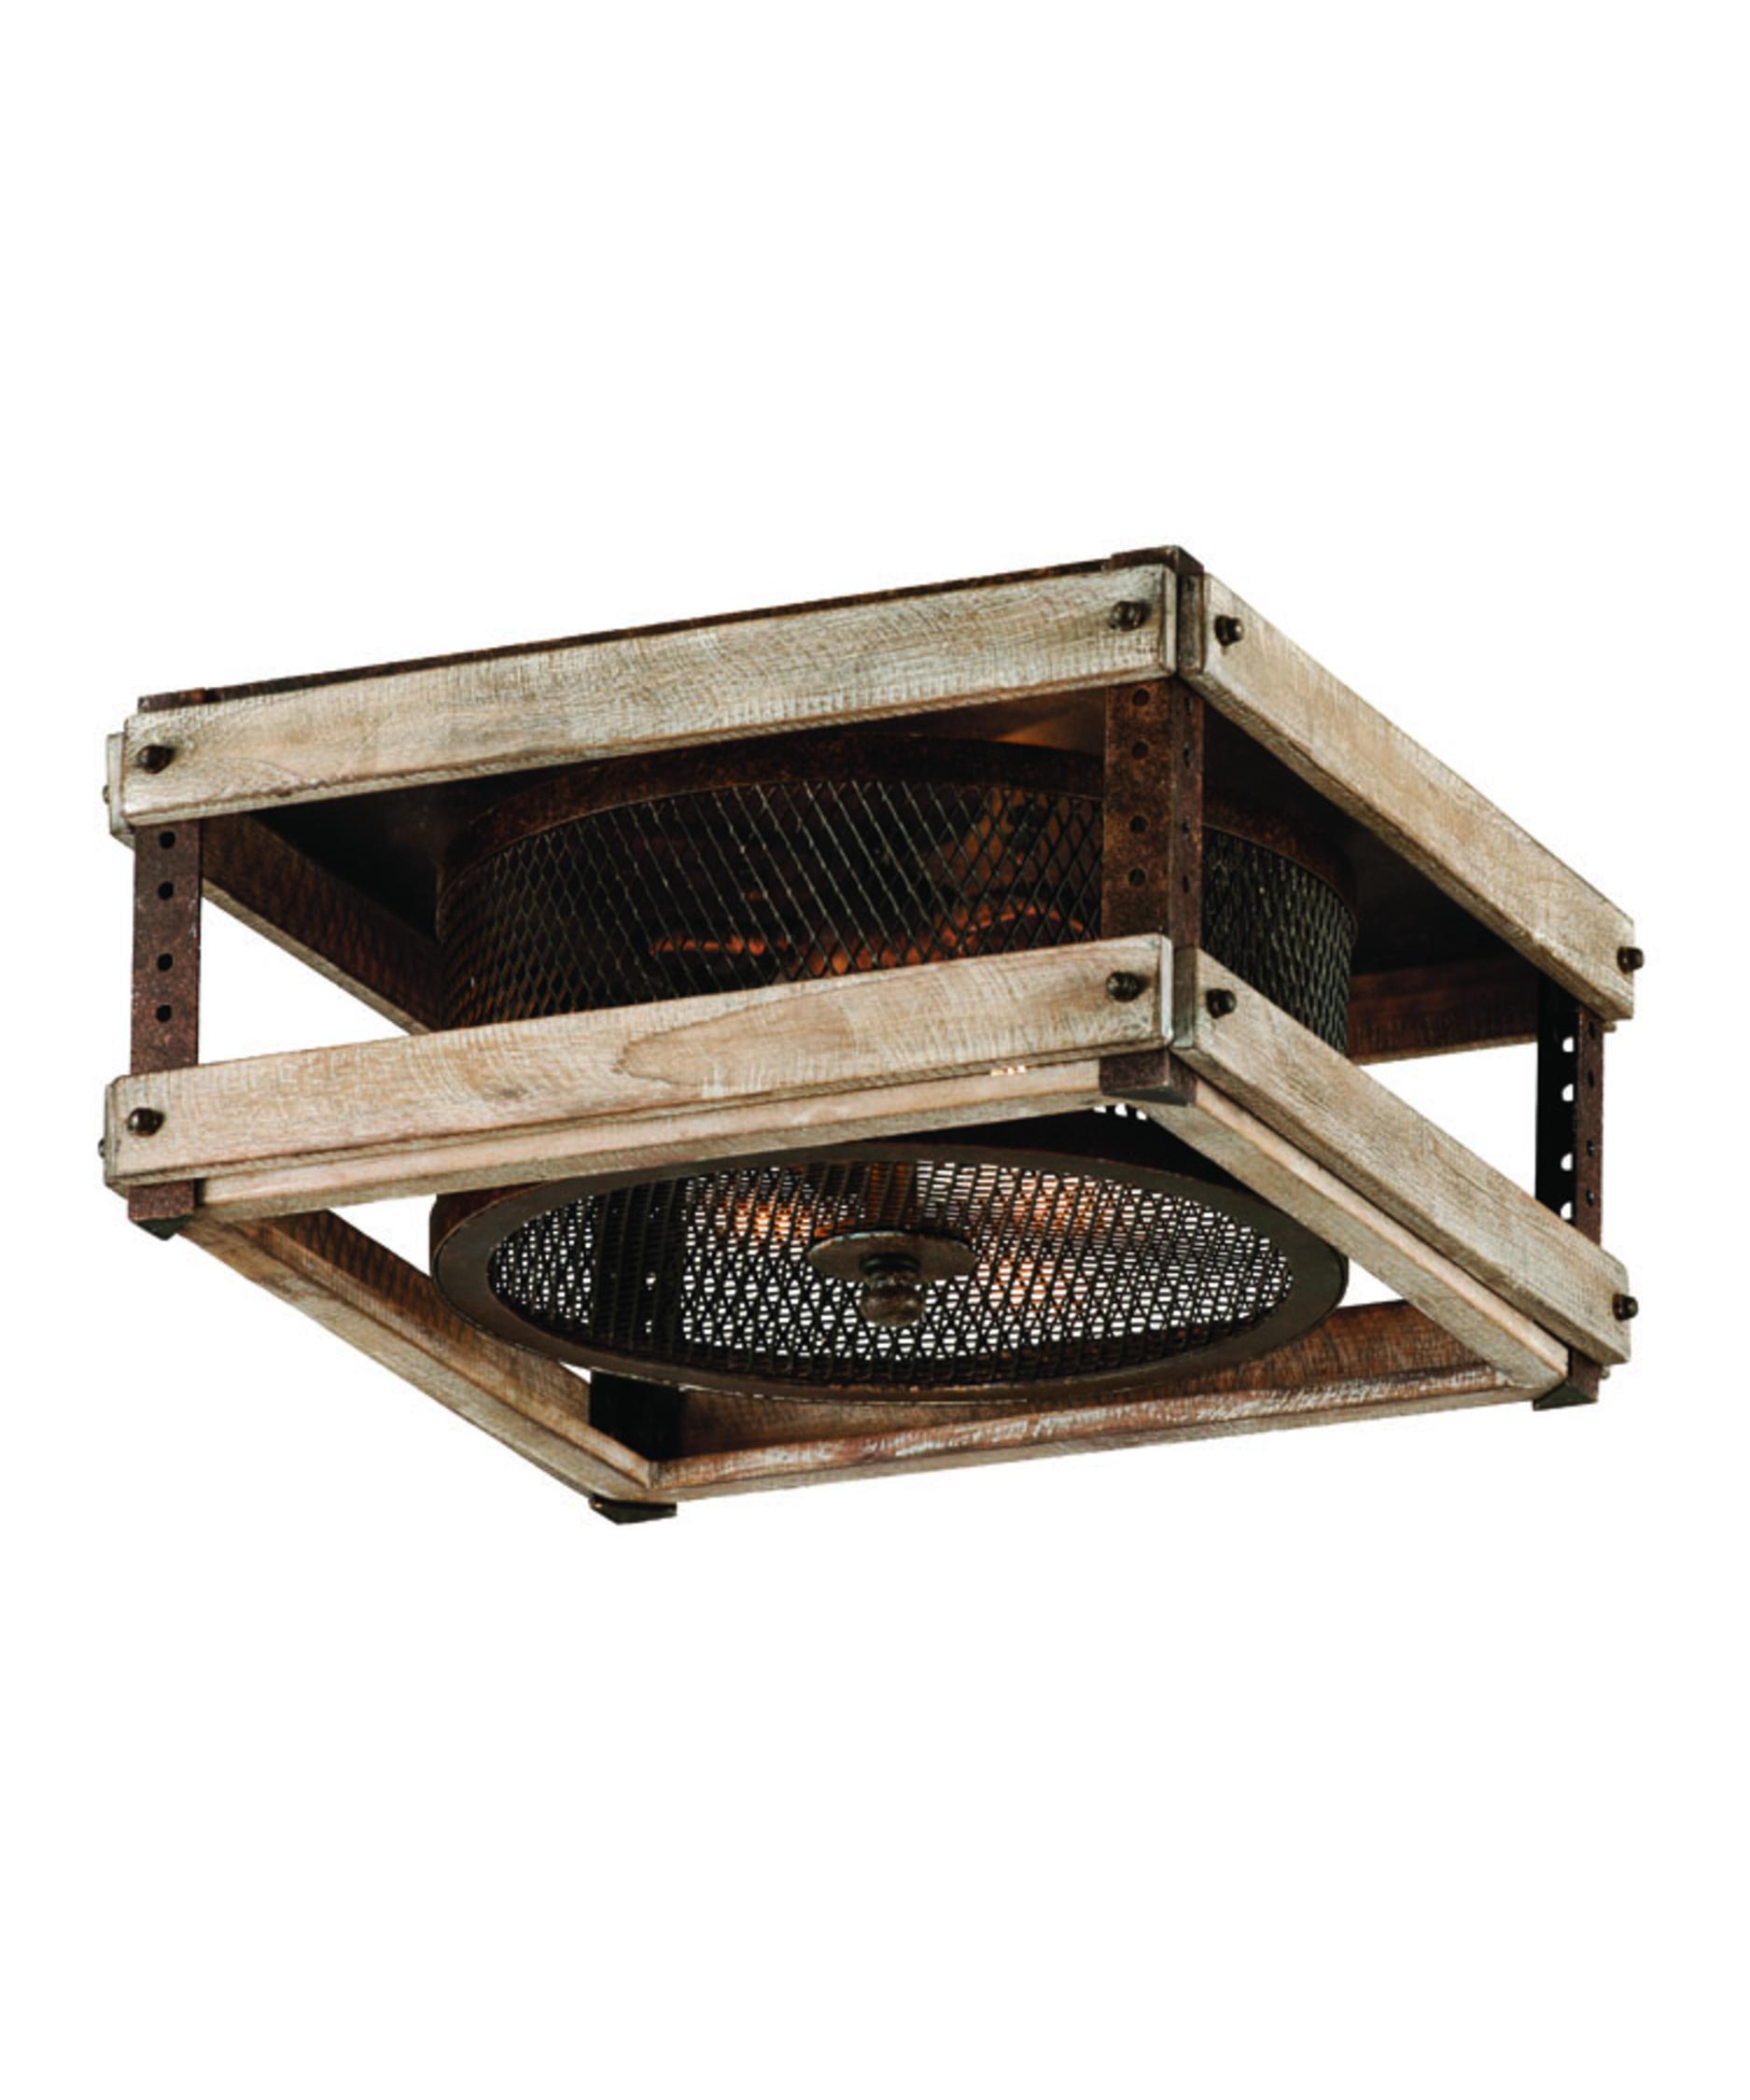 troy lighting c4060 merchant street flush mount | capitol lighting